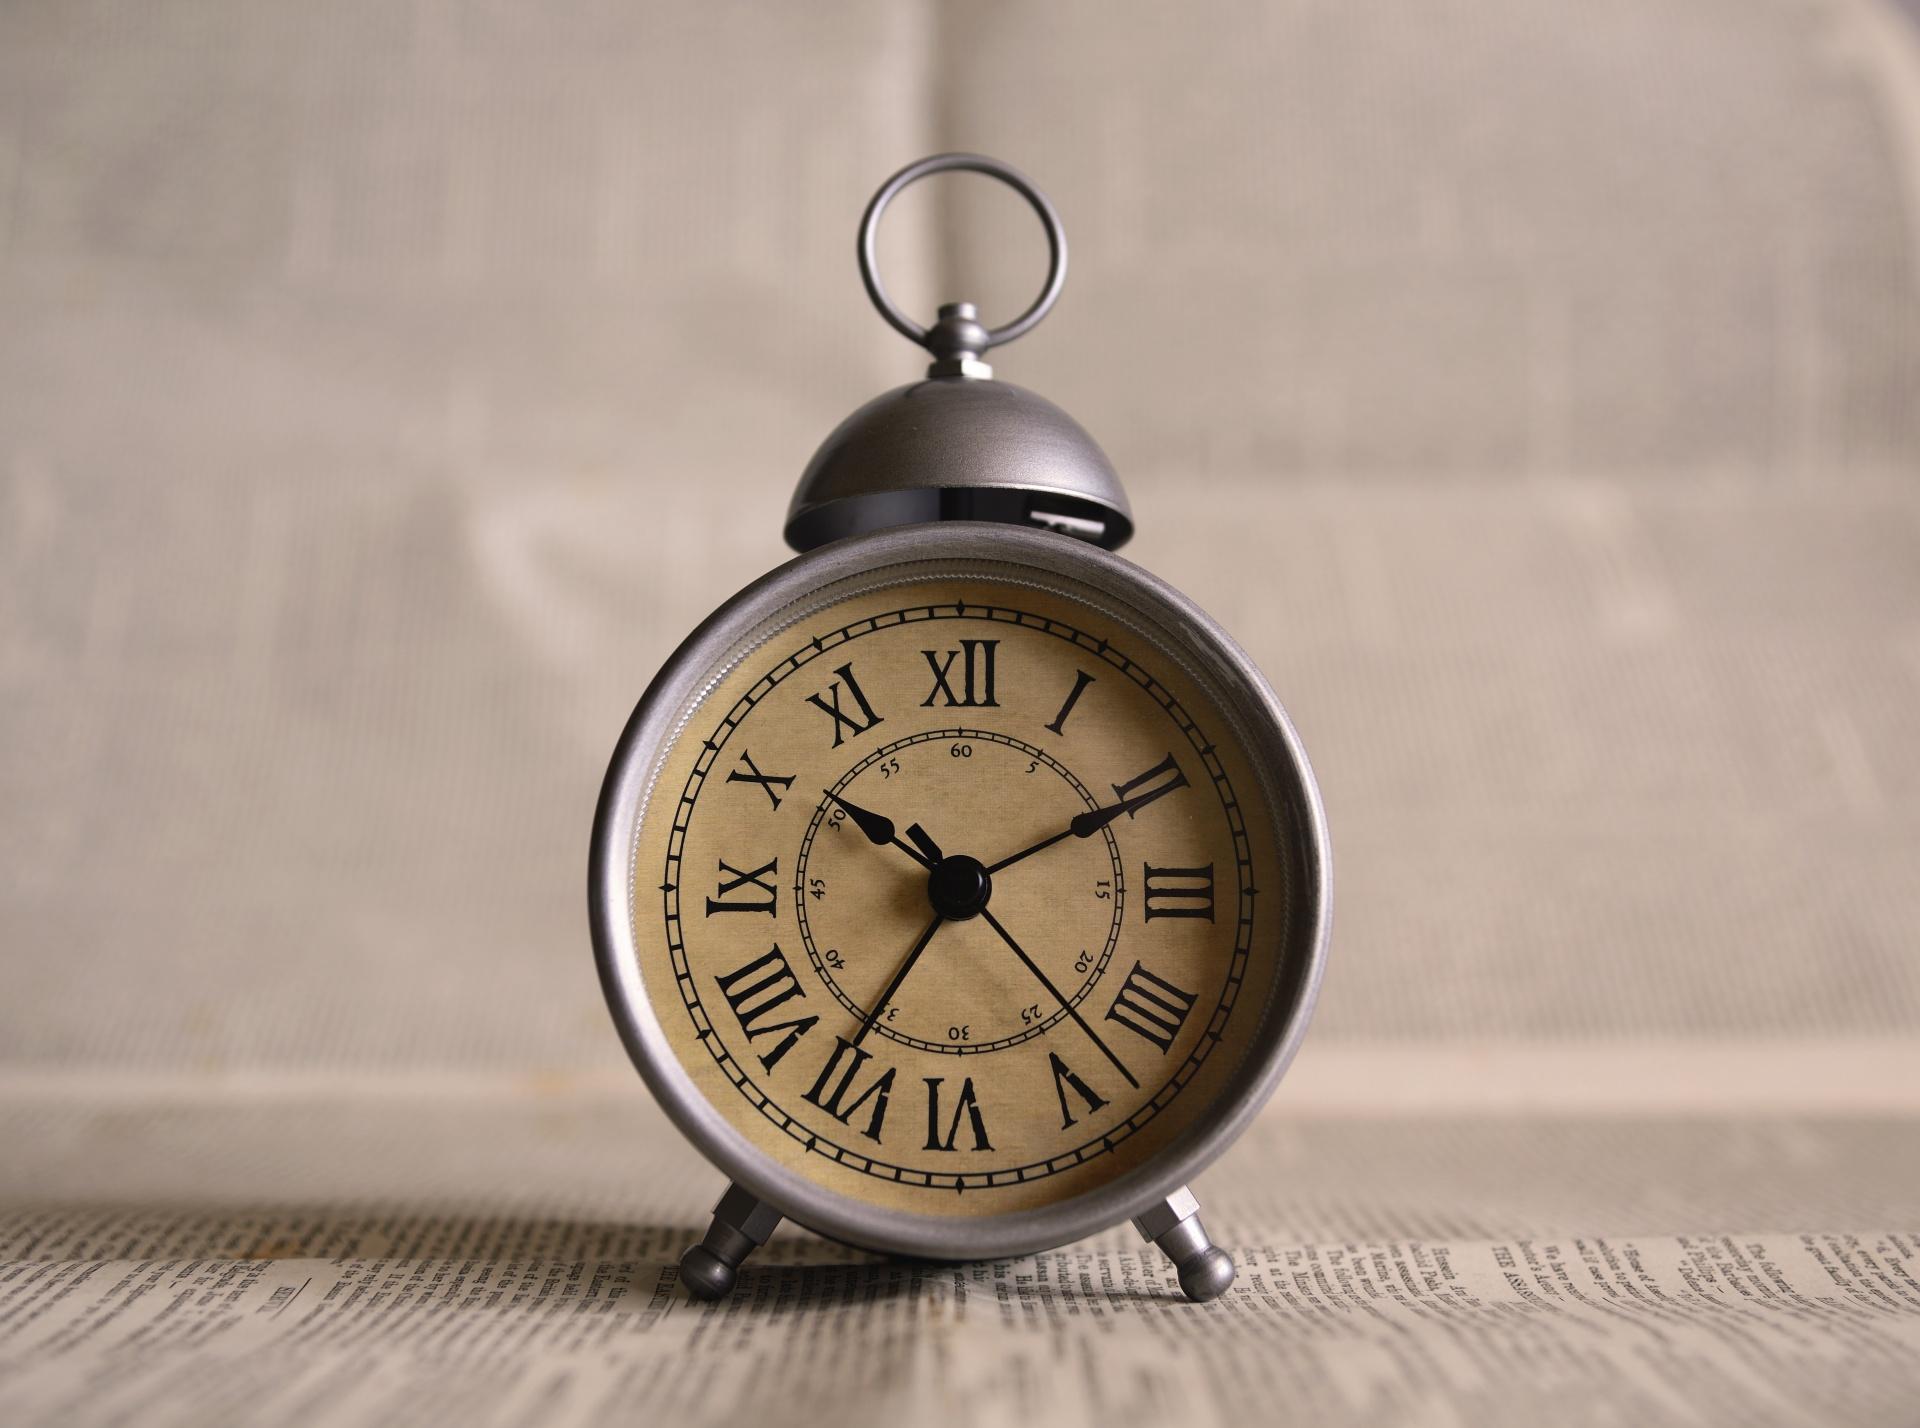 Clock,sound,sleep,work,time - free photo from needpix com